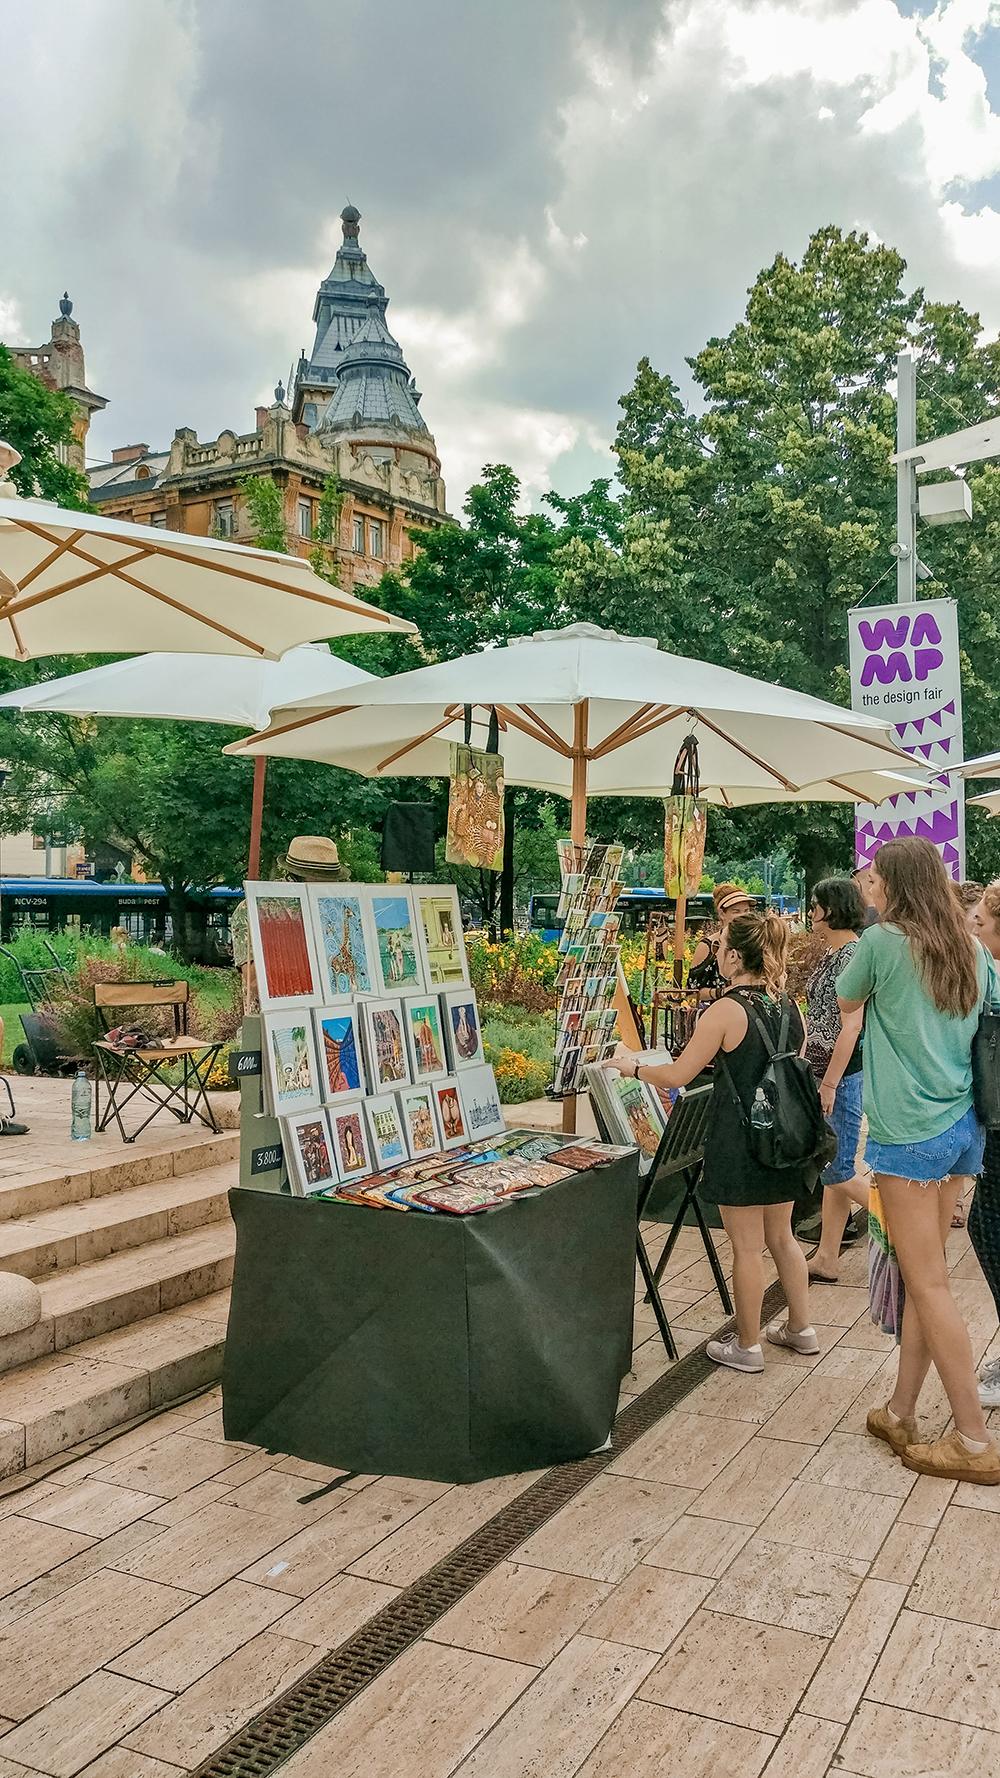 WAMP design fair - Budapest design shop guide to best Hungarian souvenirs | Aliz's Wonderland